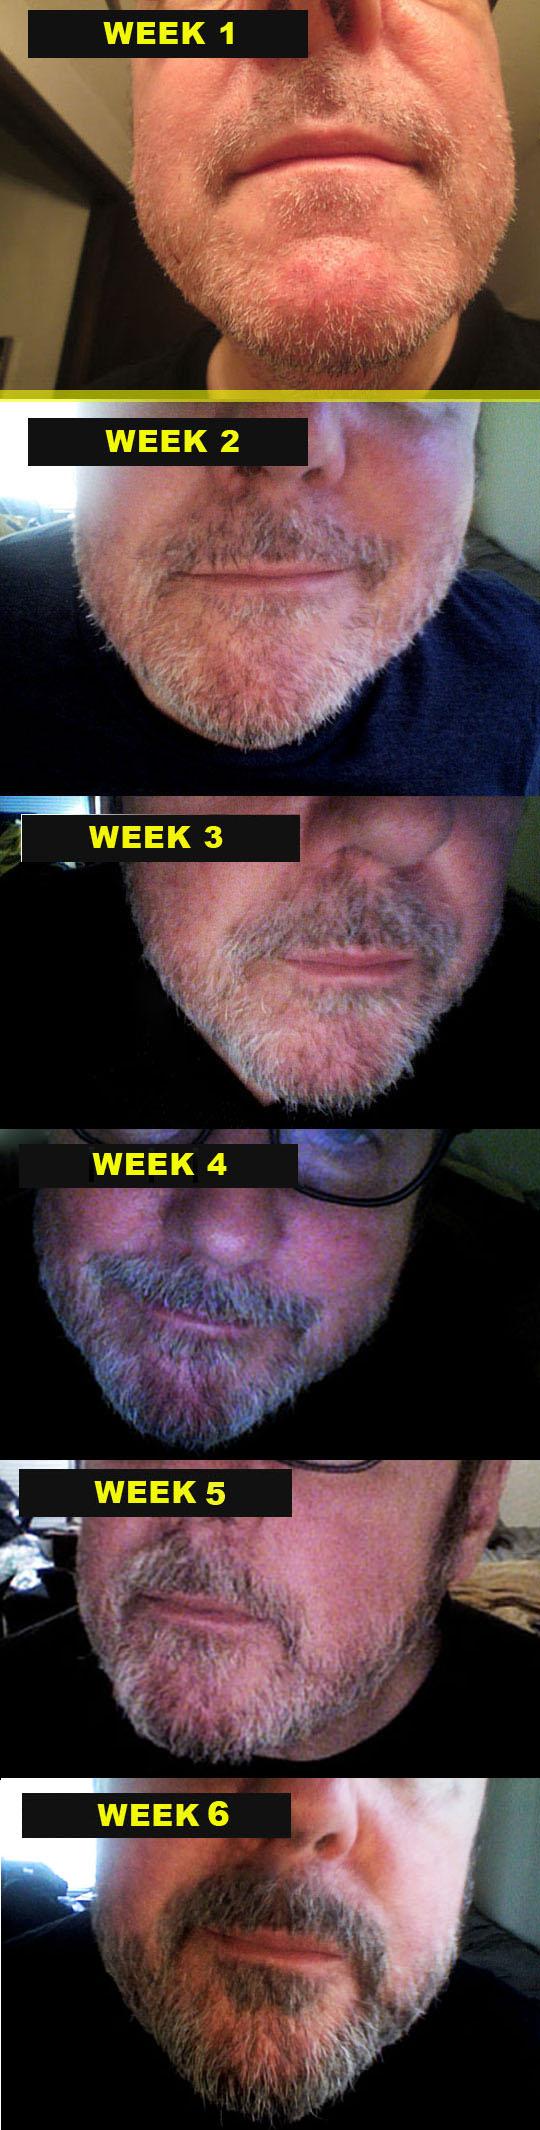 7. weeklygrowthfeb2-19.jpg